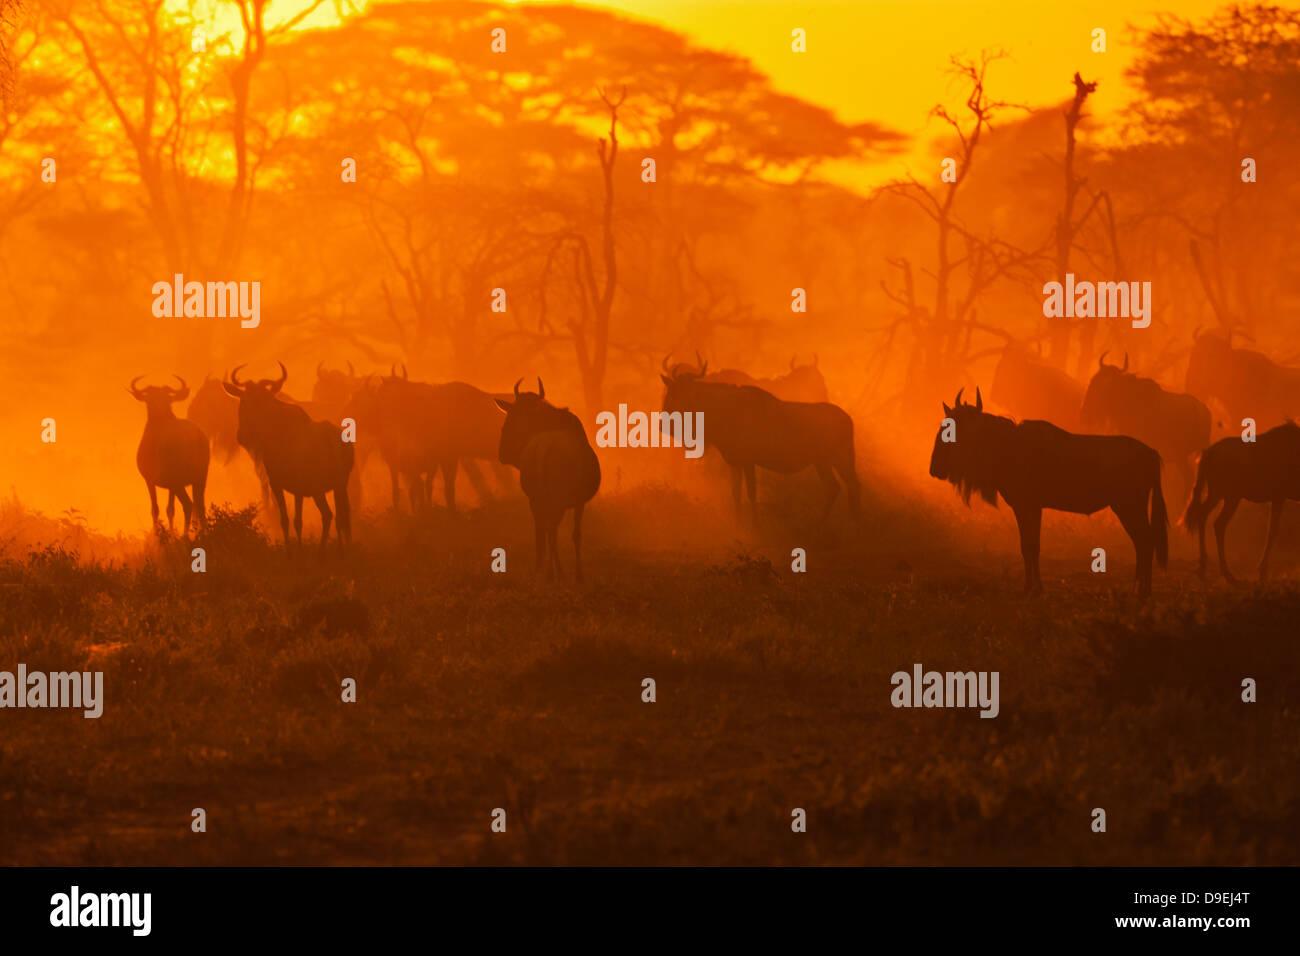 Wildebeest herd at sunrise, Wildebeest Migration, Serengeti Ecosystem, Tanzania - Stock Image